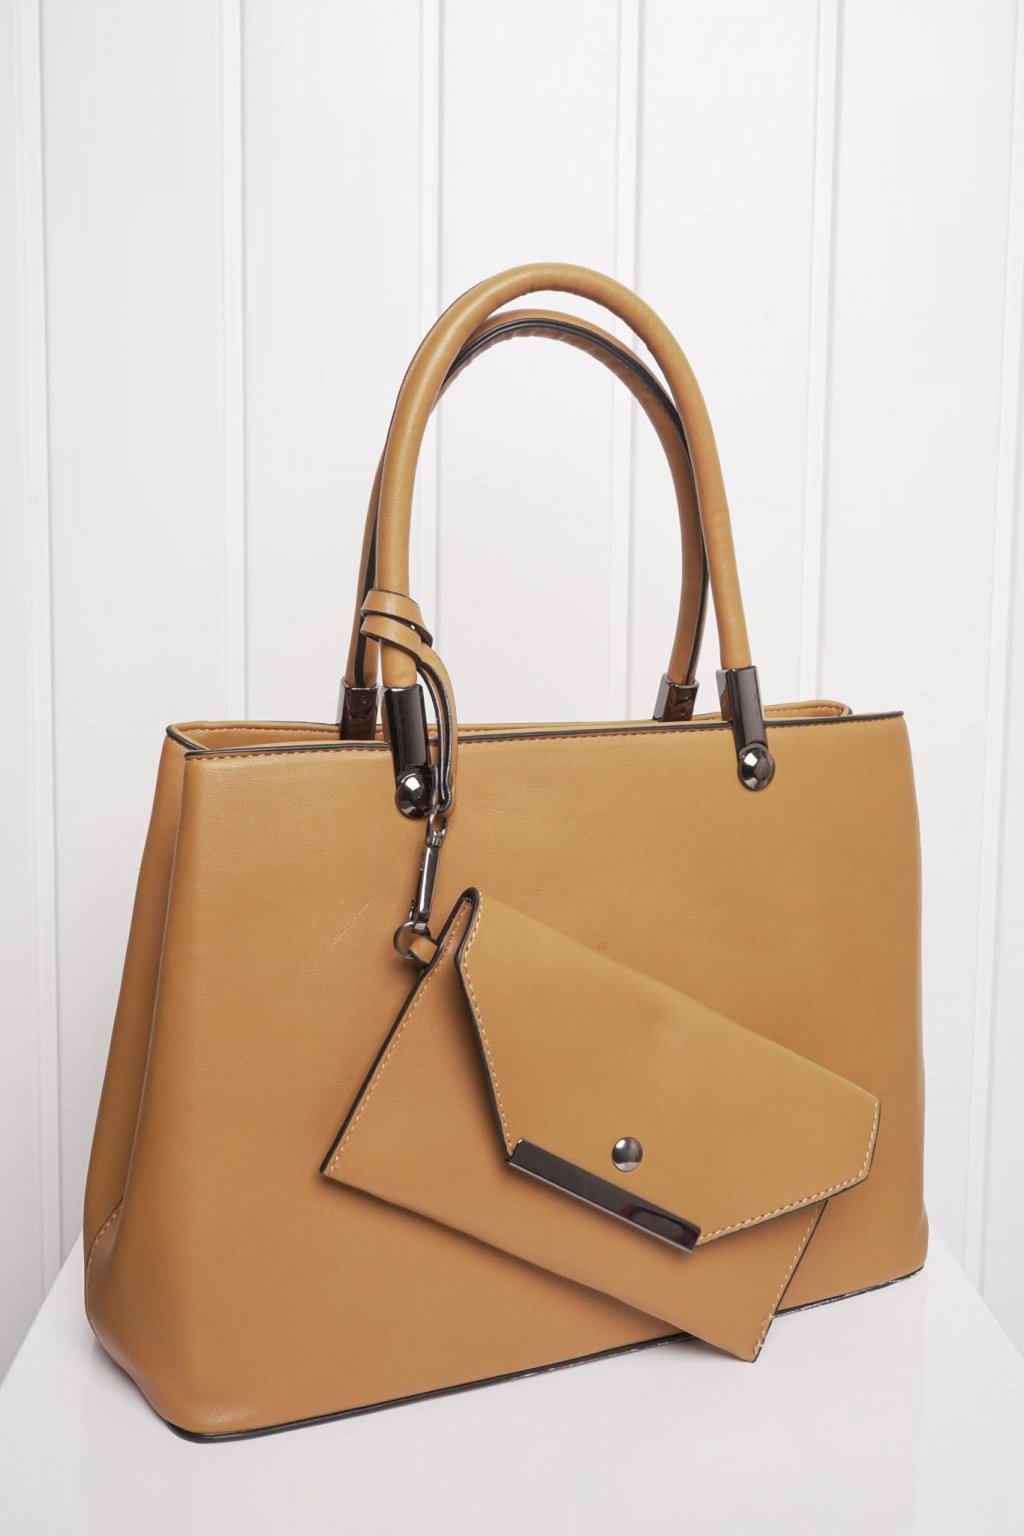 Kabelka, ruksak, dobrá cena, čierna kabelka, čierny ruksak, basic, kabelky, ruksaky 137